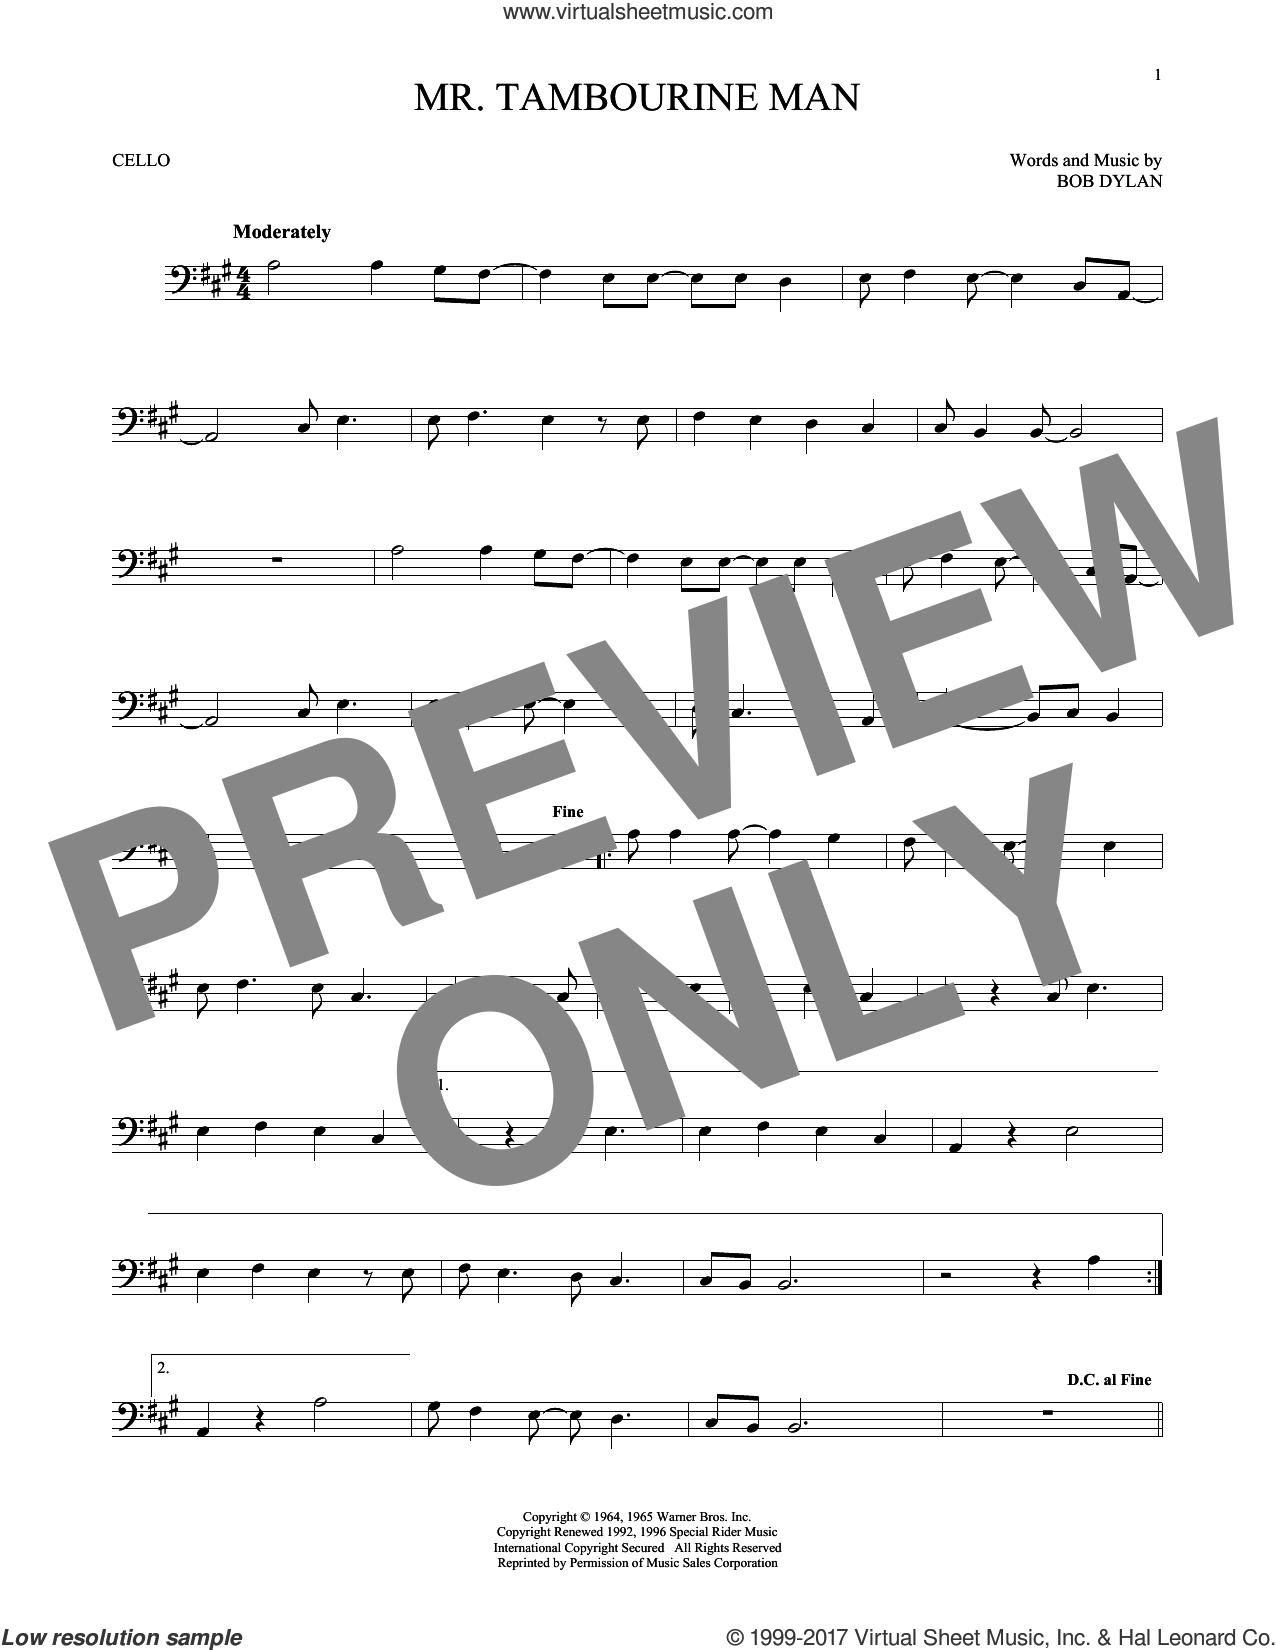 Mr. Tambourine Man sheet music for cello solo by Bob Dylan, intermediate skill level